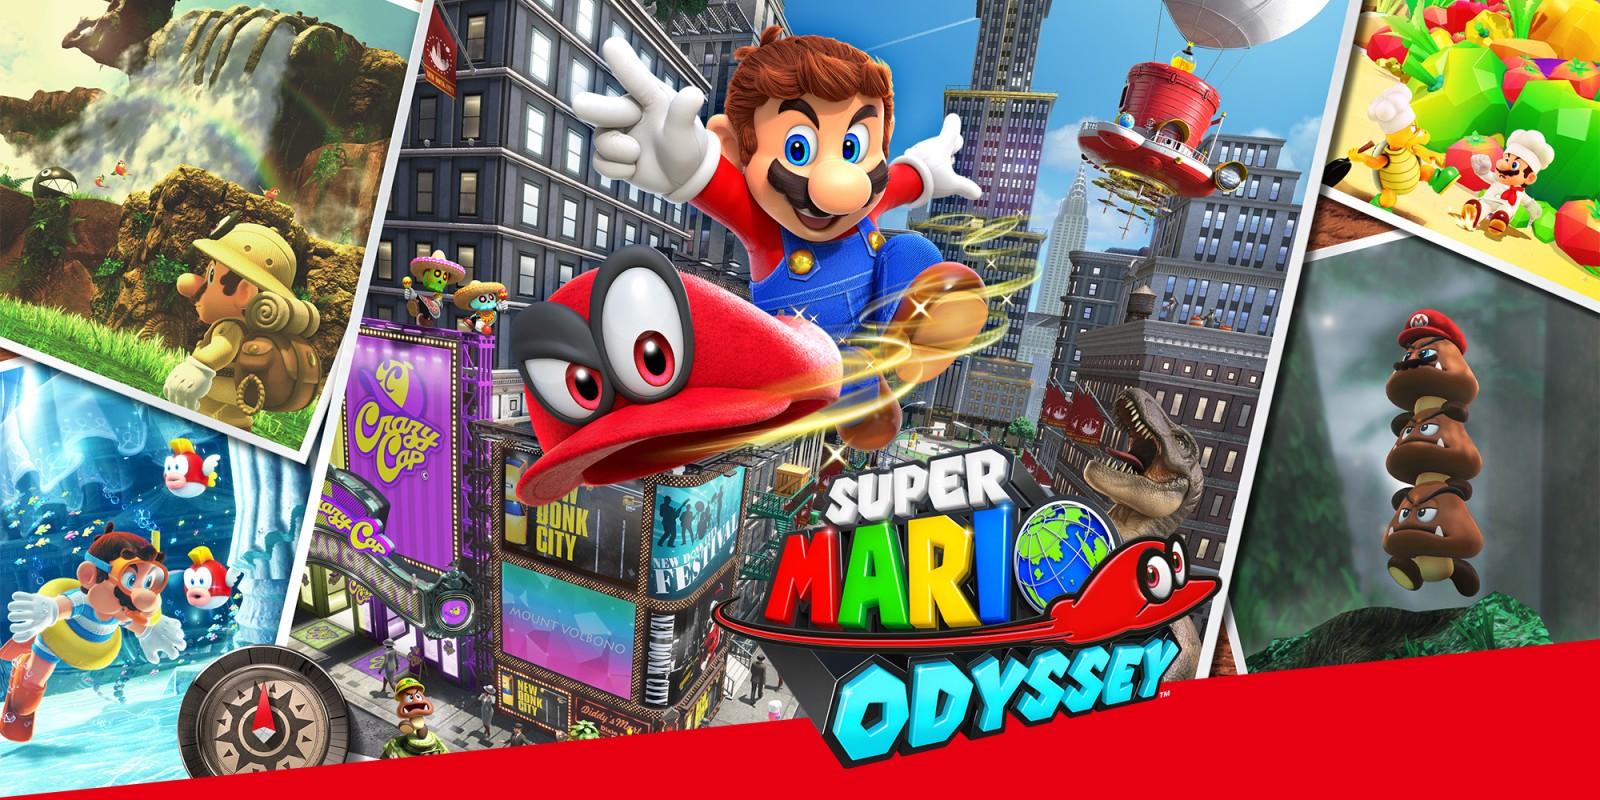 Super Mario Odyssey Nintendo Switch - £34.99 @ Nintendo Eshop